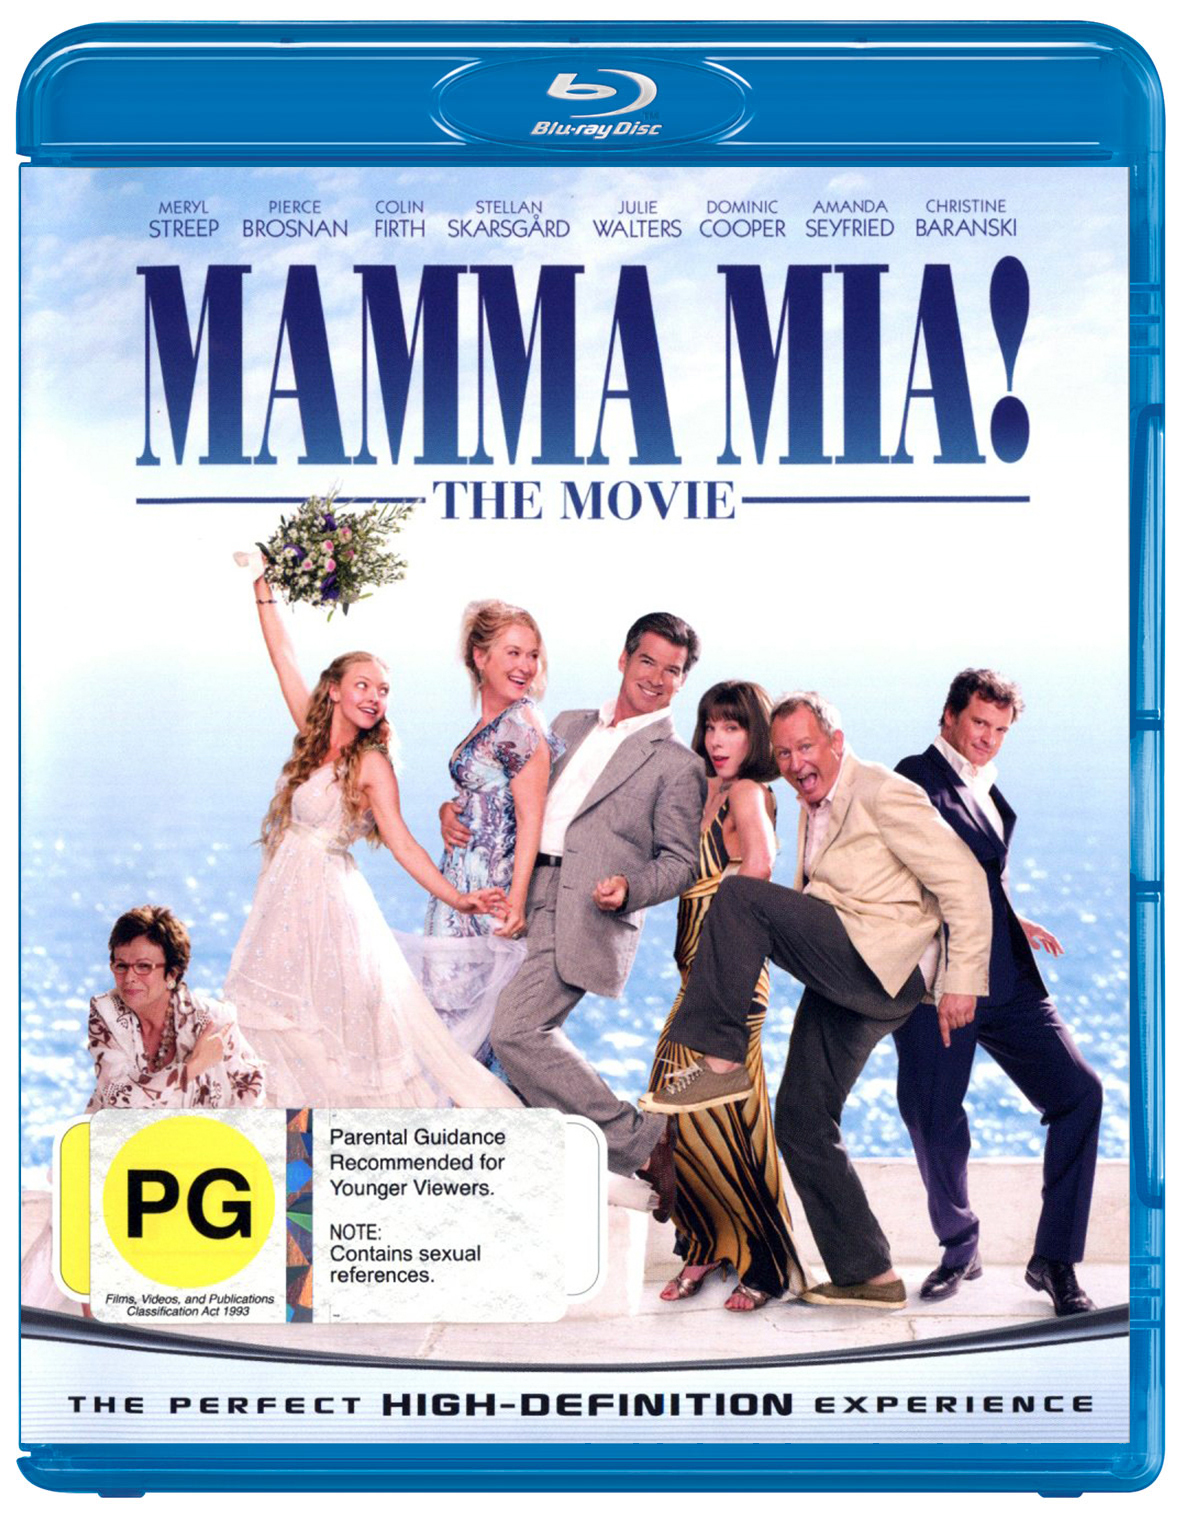 Mamma Mia!: The Movie on Blu-ray image